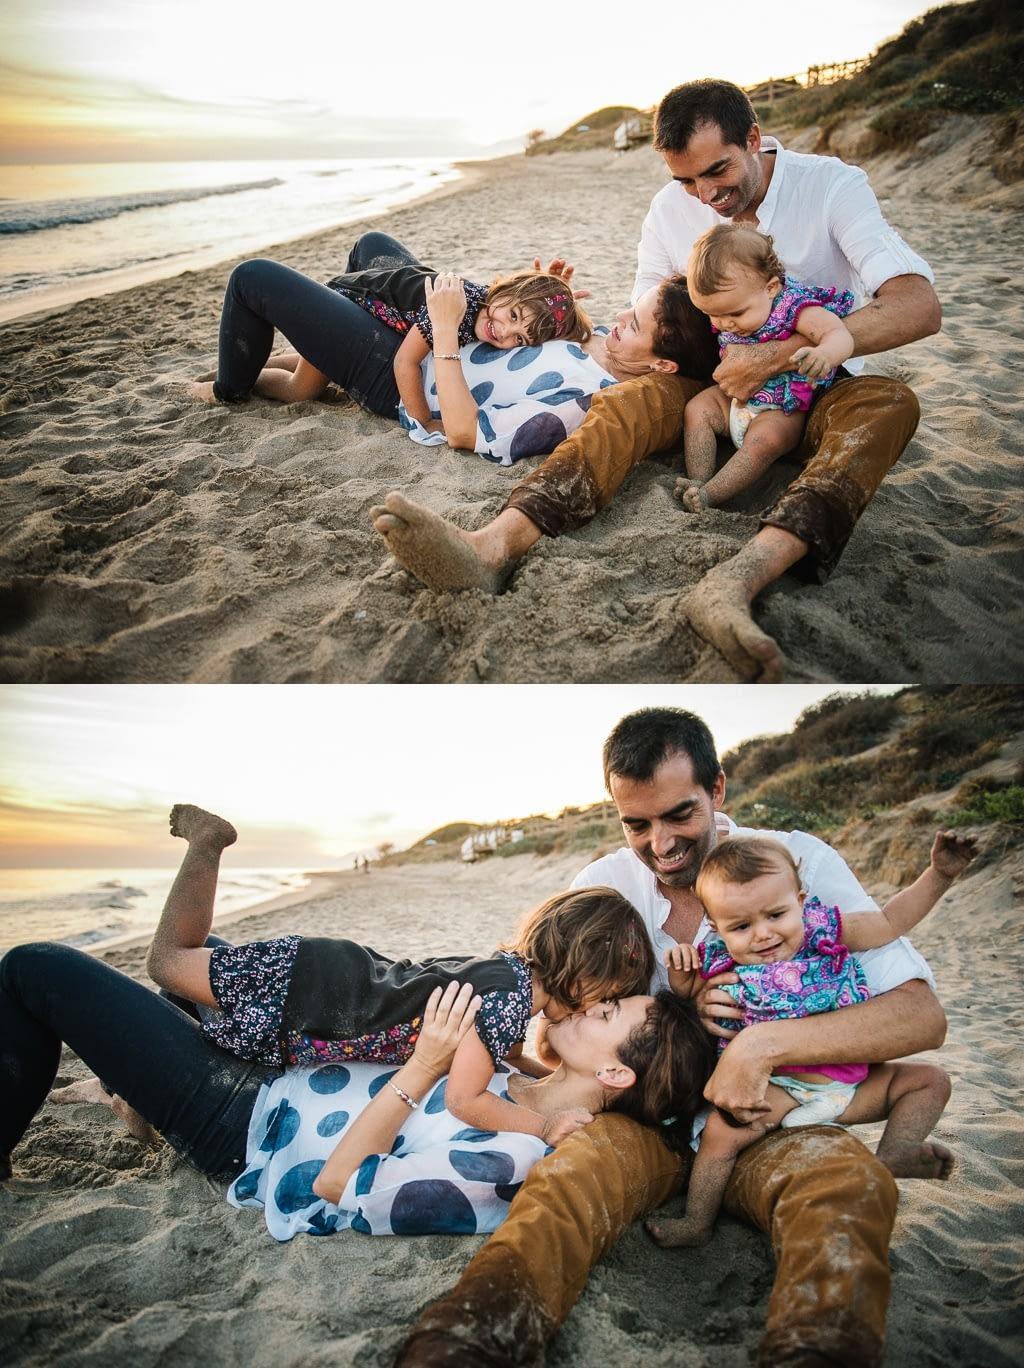 2017 11 09 Fotografia de familia Málaga 0016. Fotógrafa de familia en Málaga. Patricia Becaroto